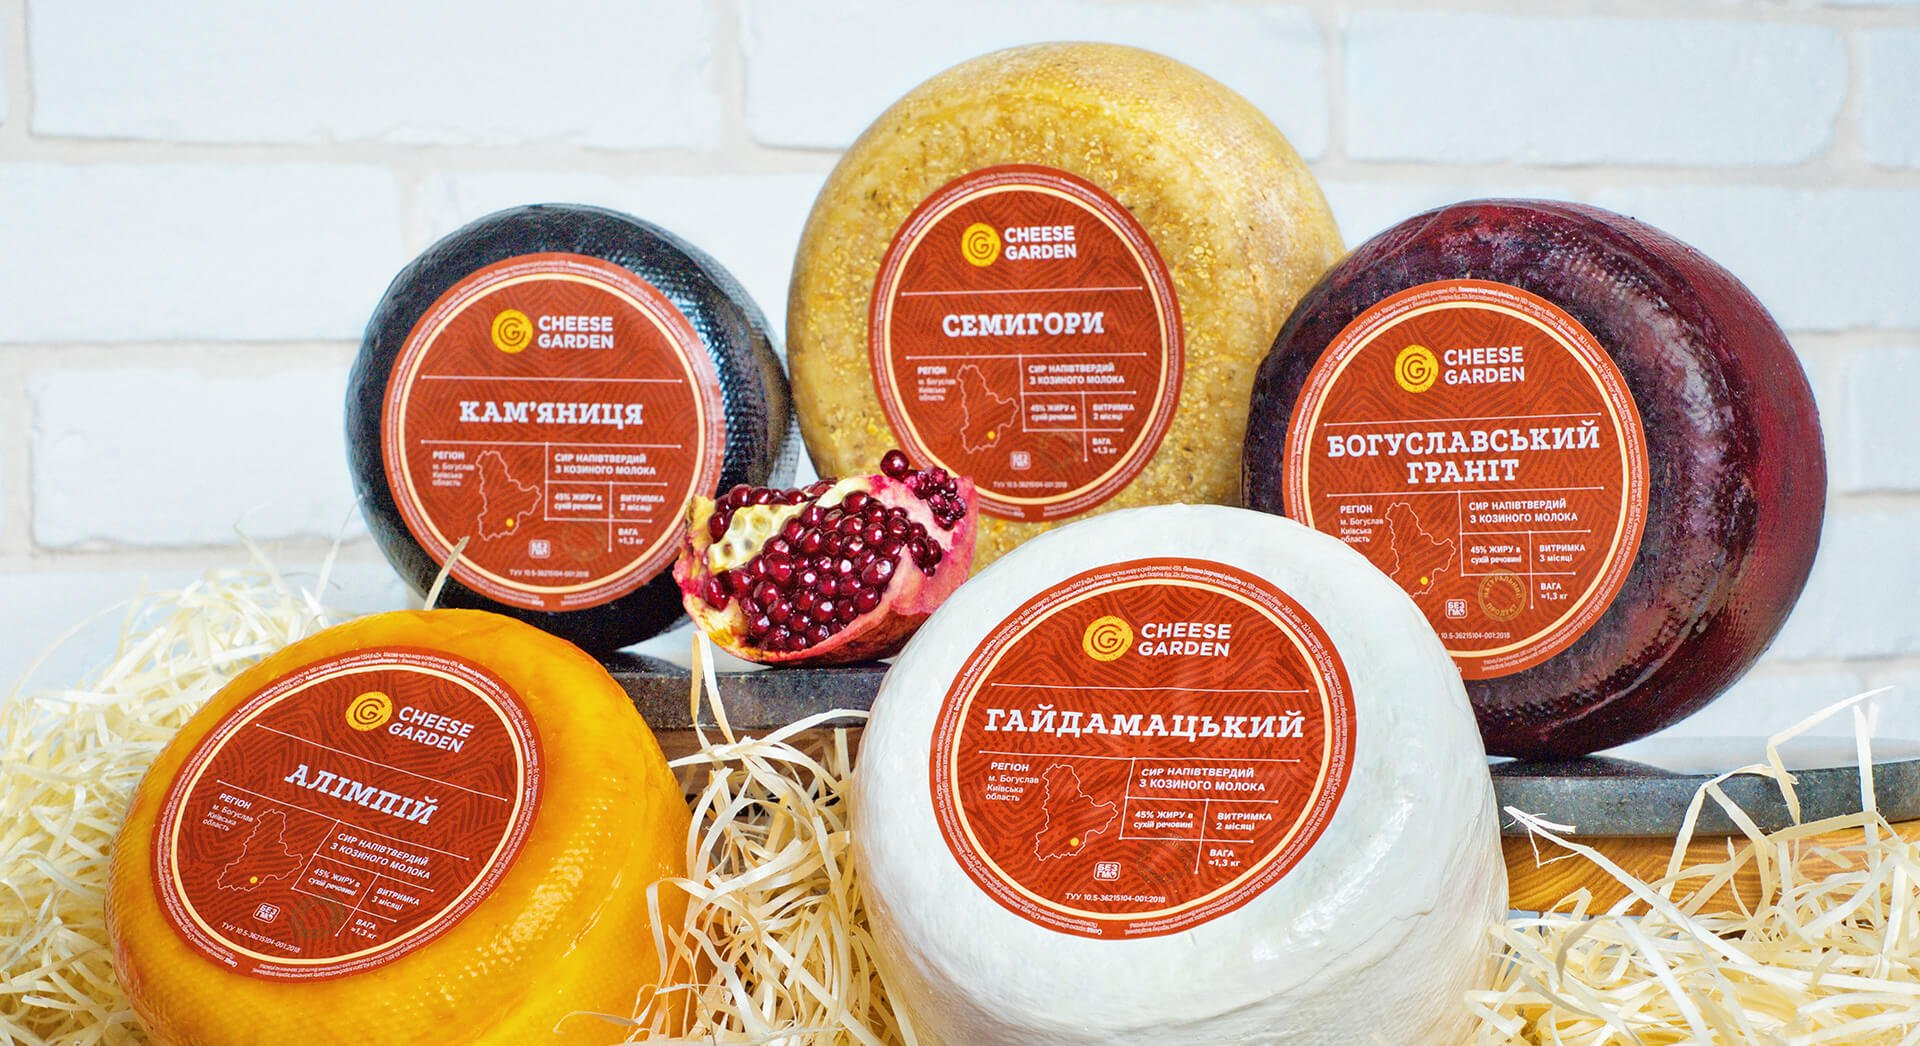 Дизайн етикеток сирів бренду «Cheese Garden»